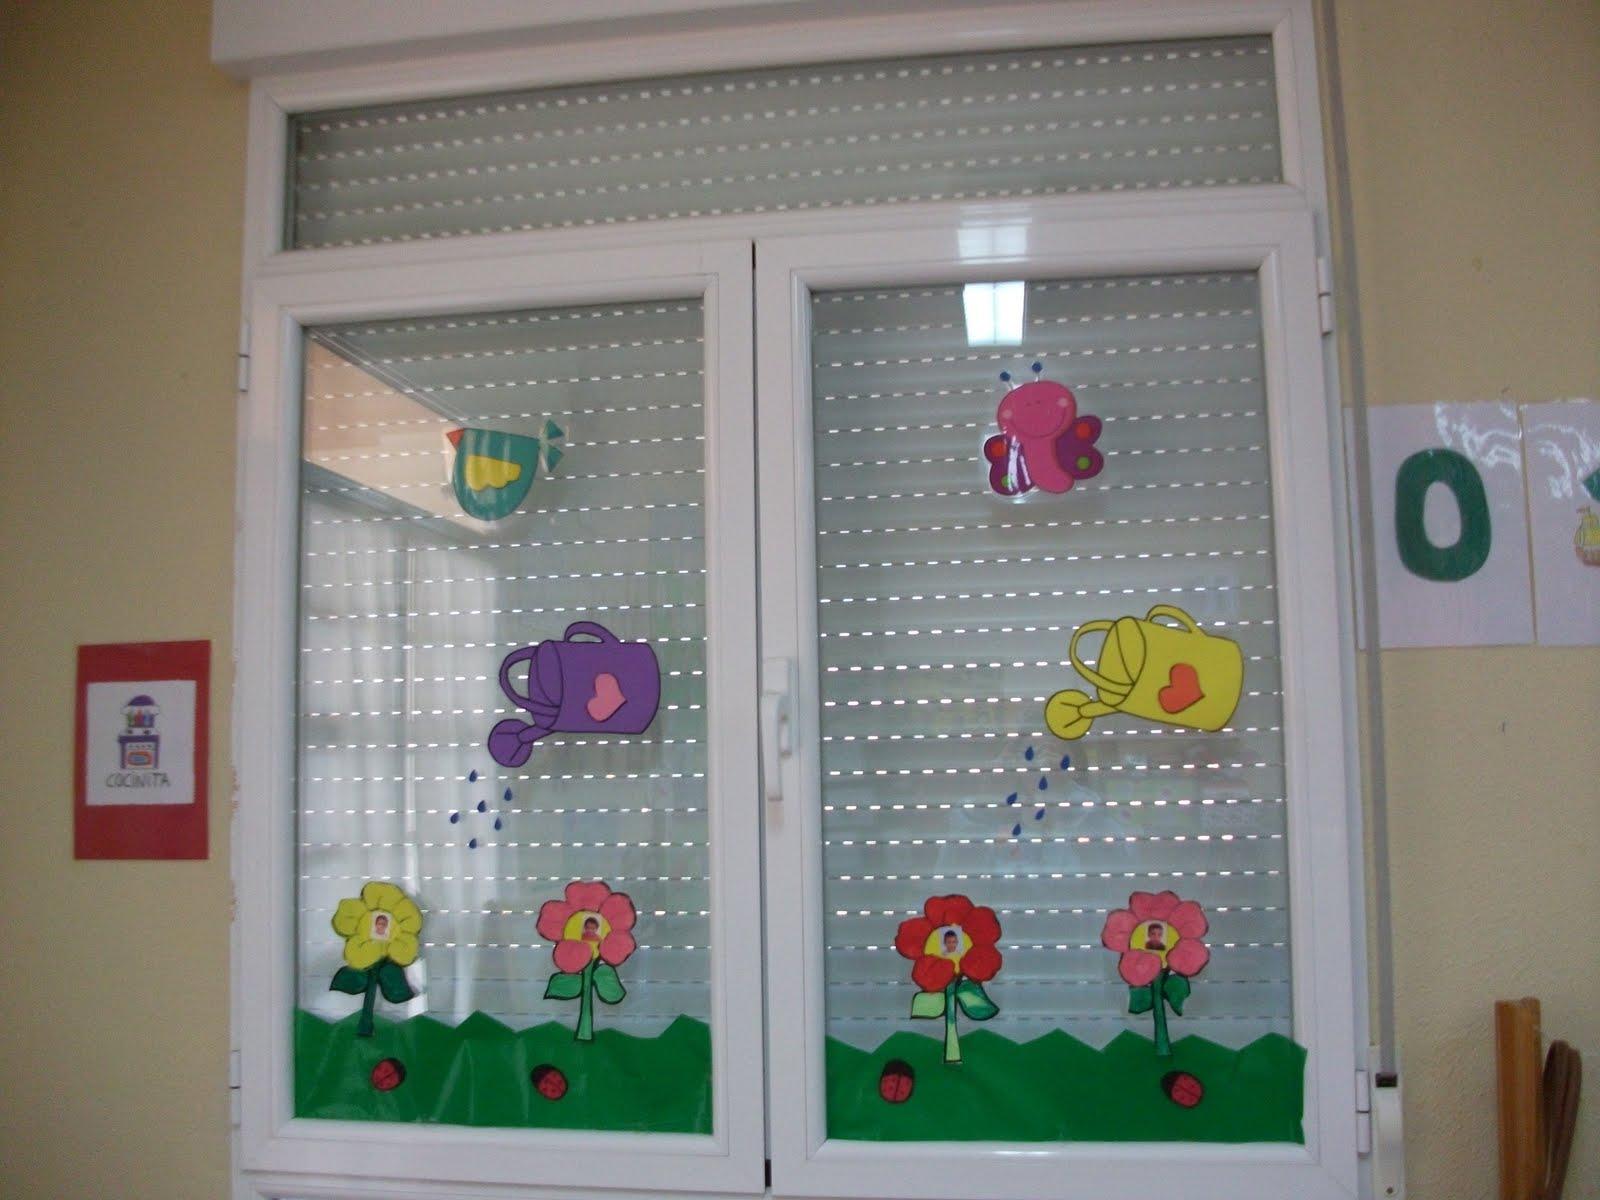 Educaci n infantil en el cra entre dos r os bienvenida for Decoracion puerta aula infantil